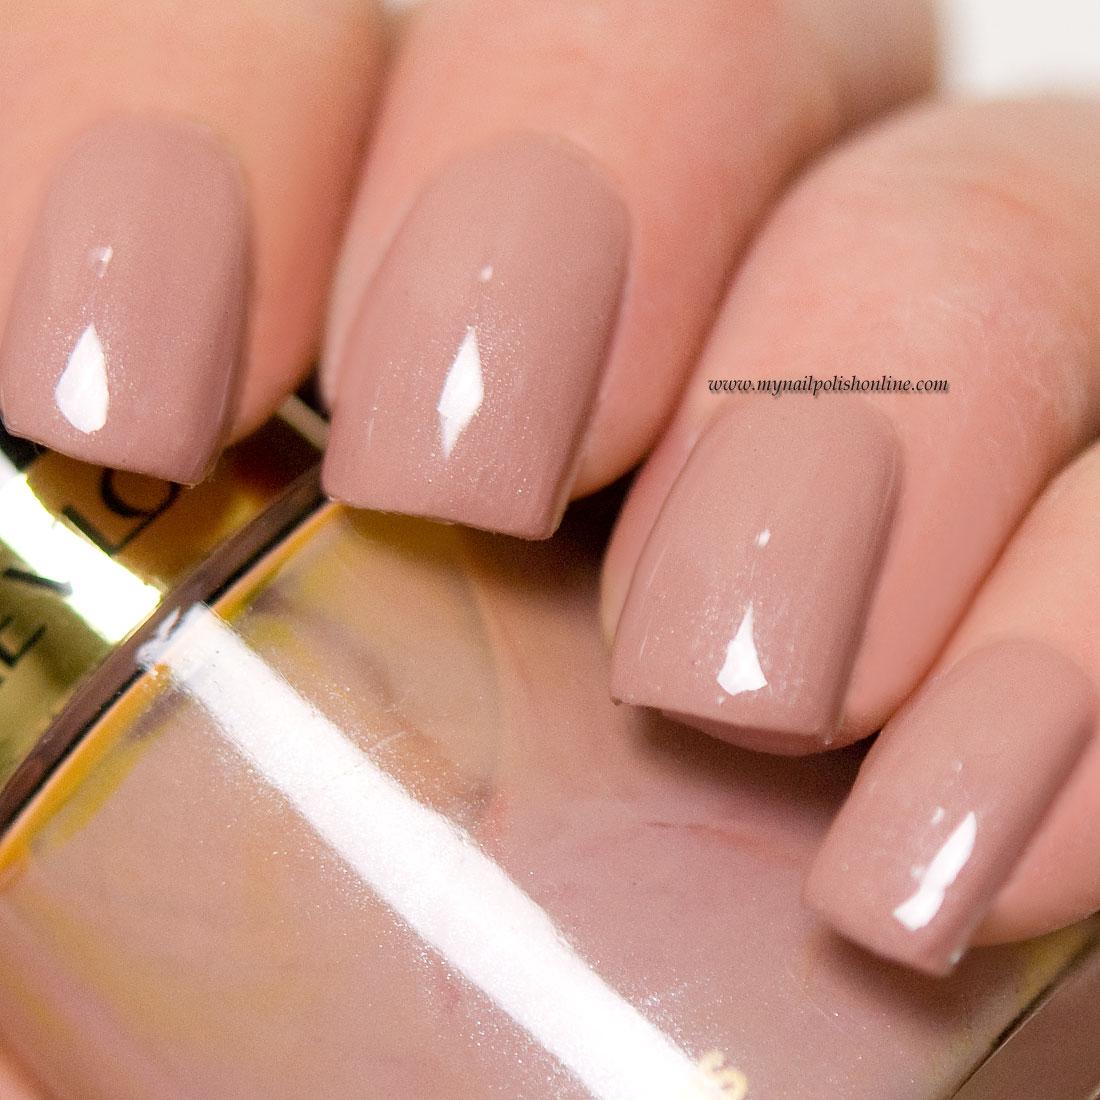 Revlon Sheer Nail Polish: My Nail Polish Online